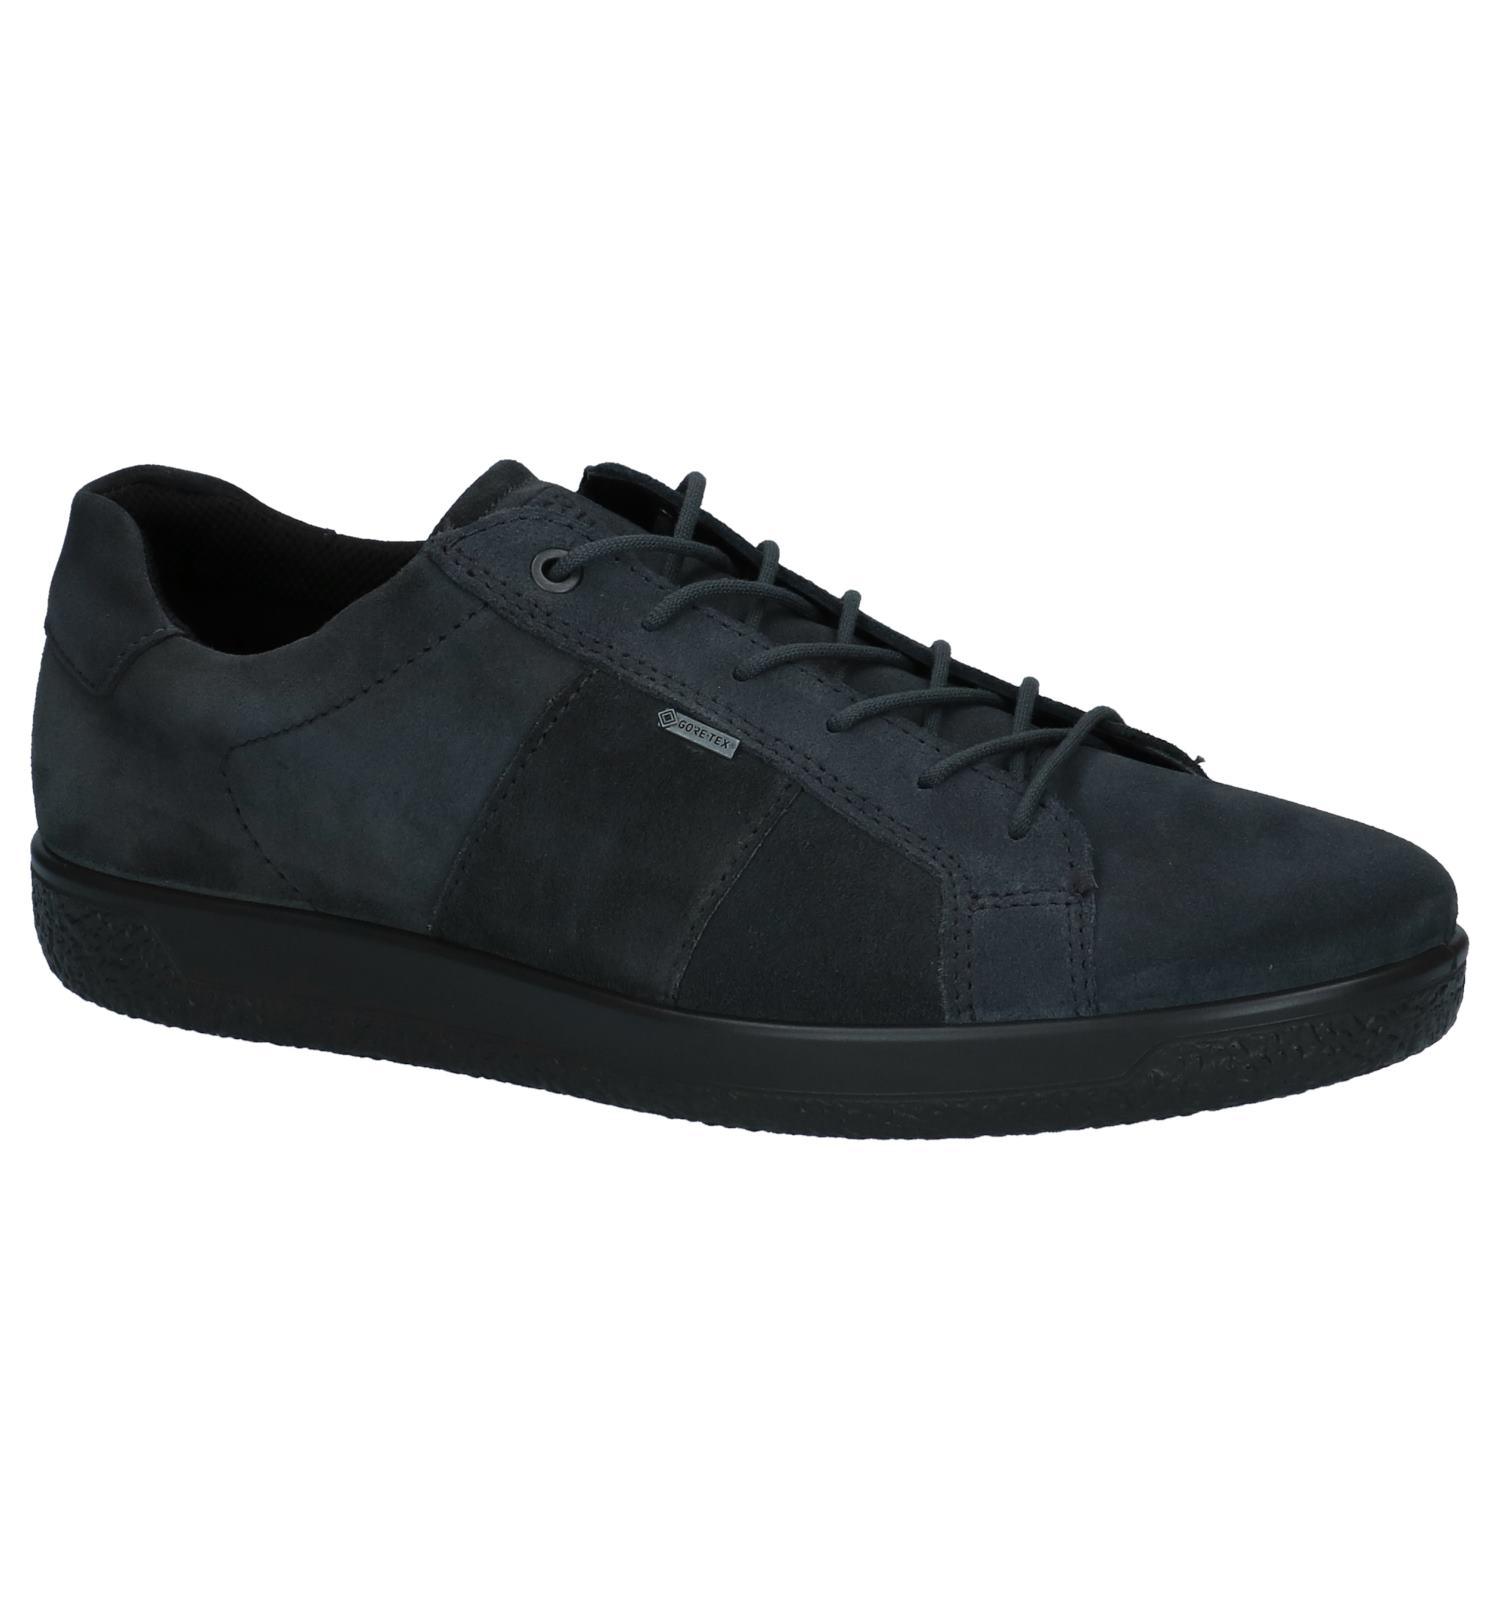 Adidas Nmd R1 Grijs Roze Shoes Size Us Sale JCZXYAGPF